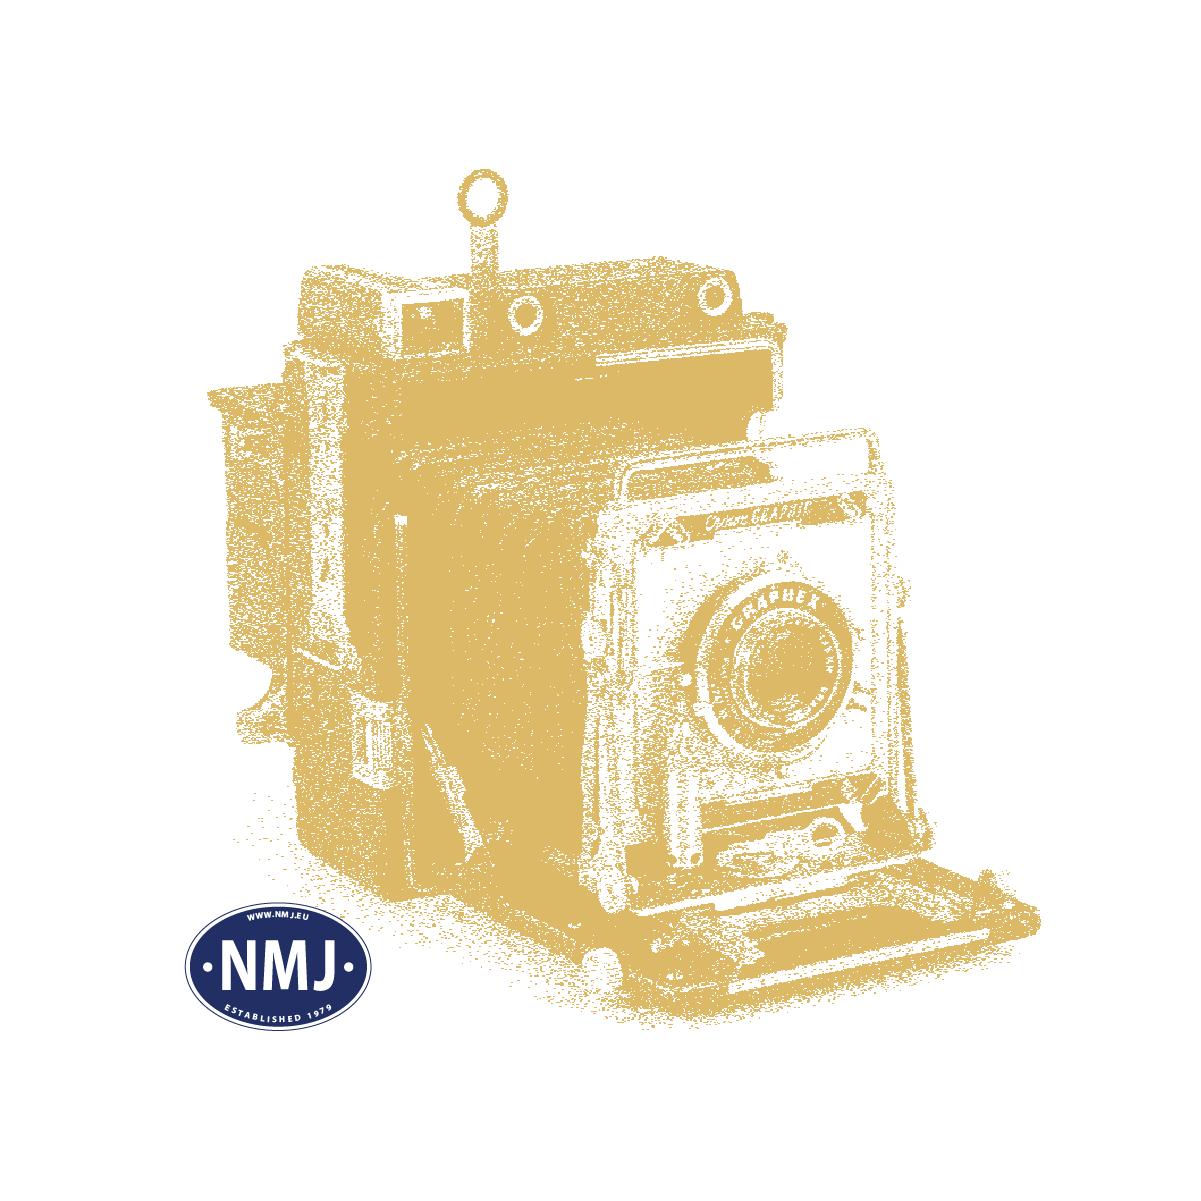 NMJT145303 - NMJ Topline CFL 1601, Early Version, DCC w/ Sound, 0-Scale